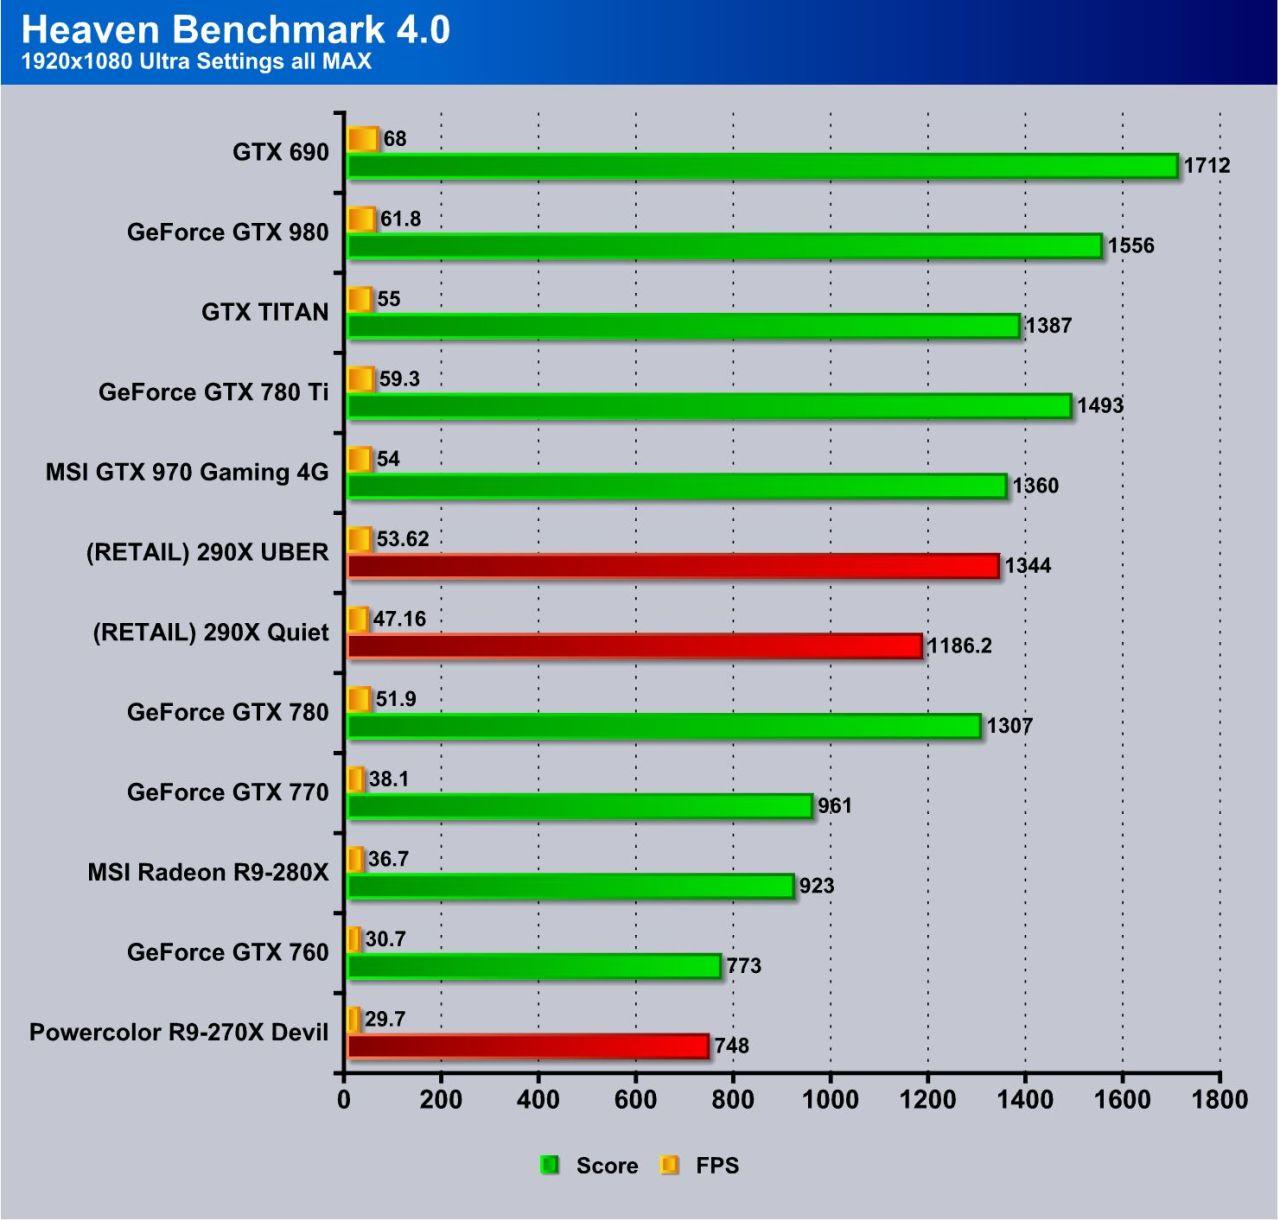 Gtx 970 msi gaming 4g драйвера